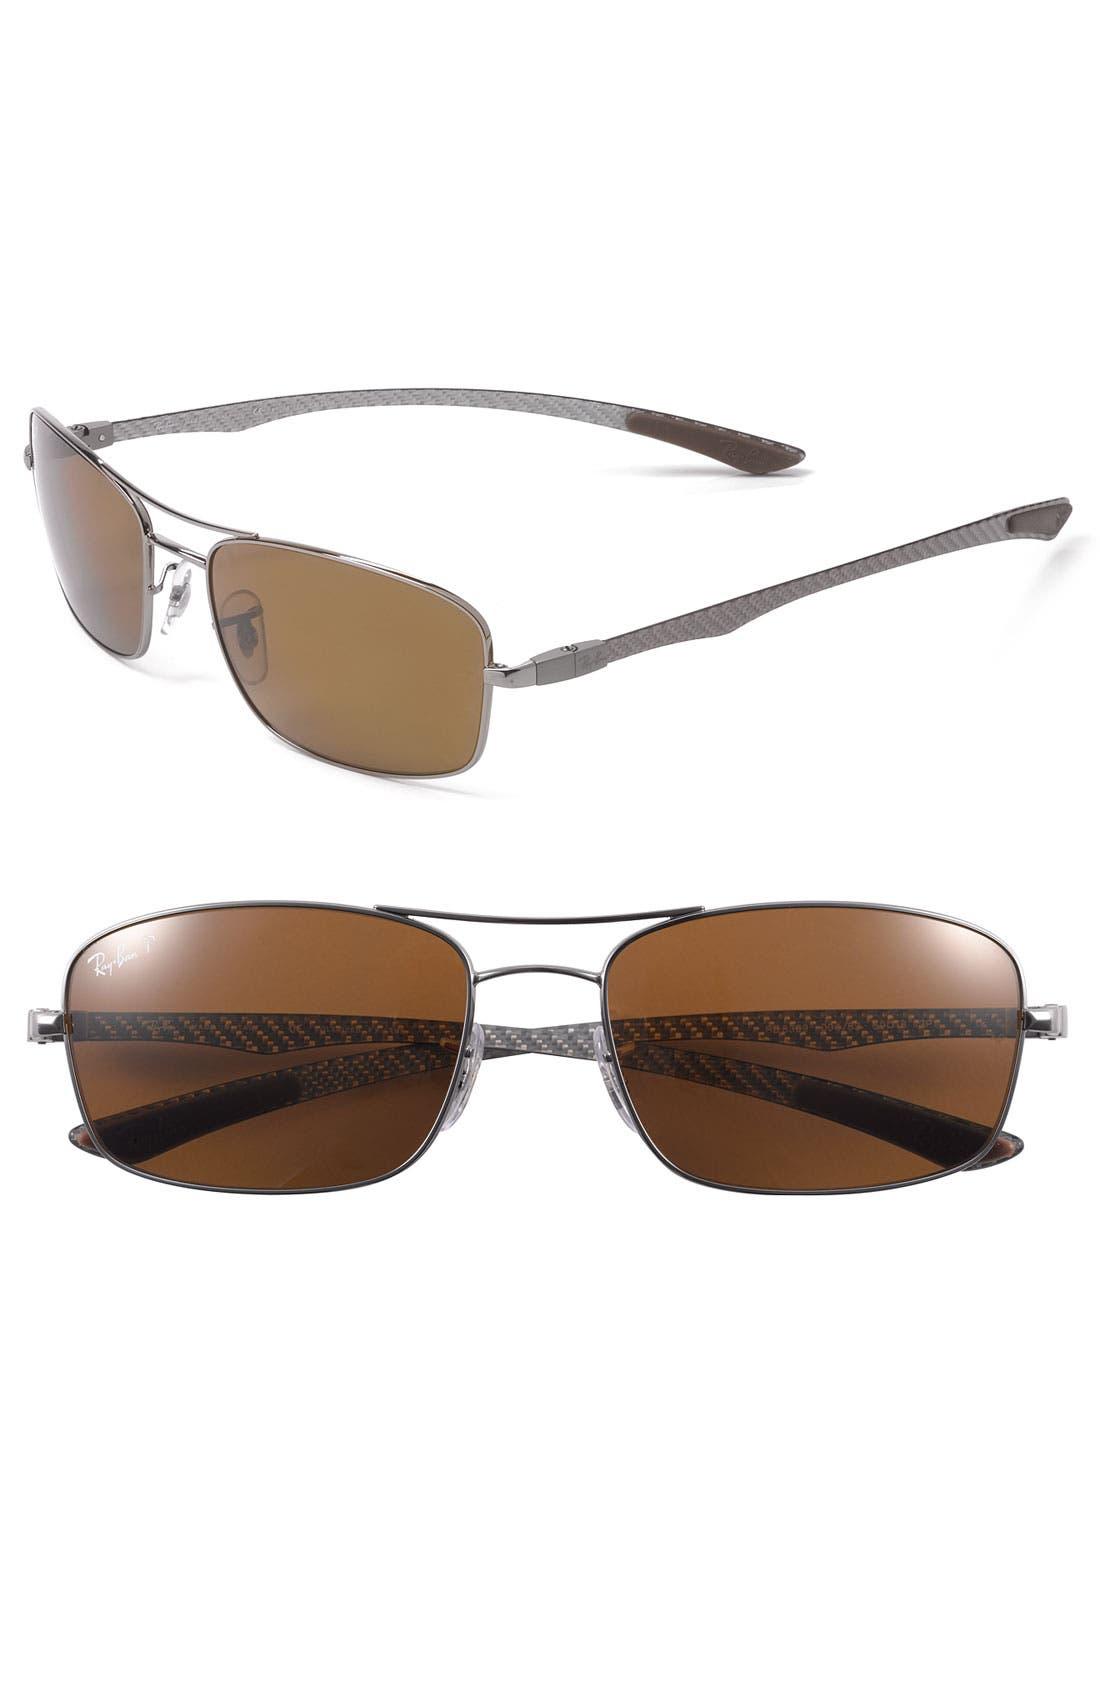 Alternate Image 1 Selected - Ray-Ban 59mm Polarized Double Bridge Sunglasses